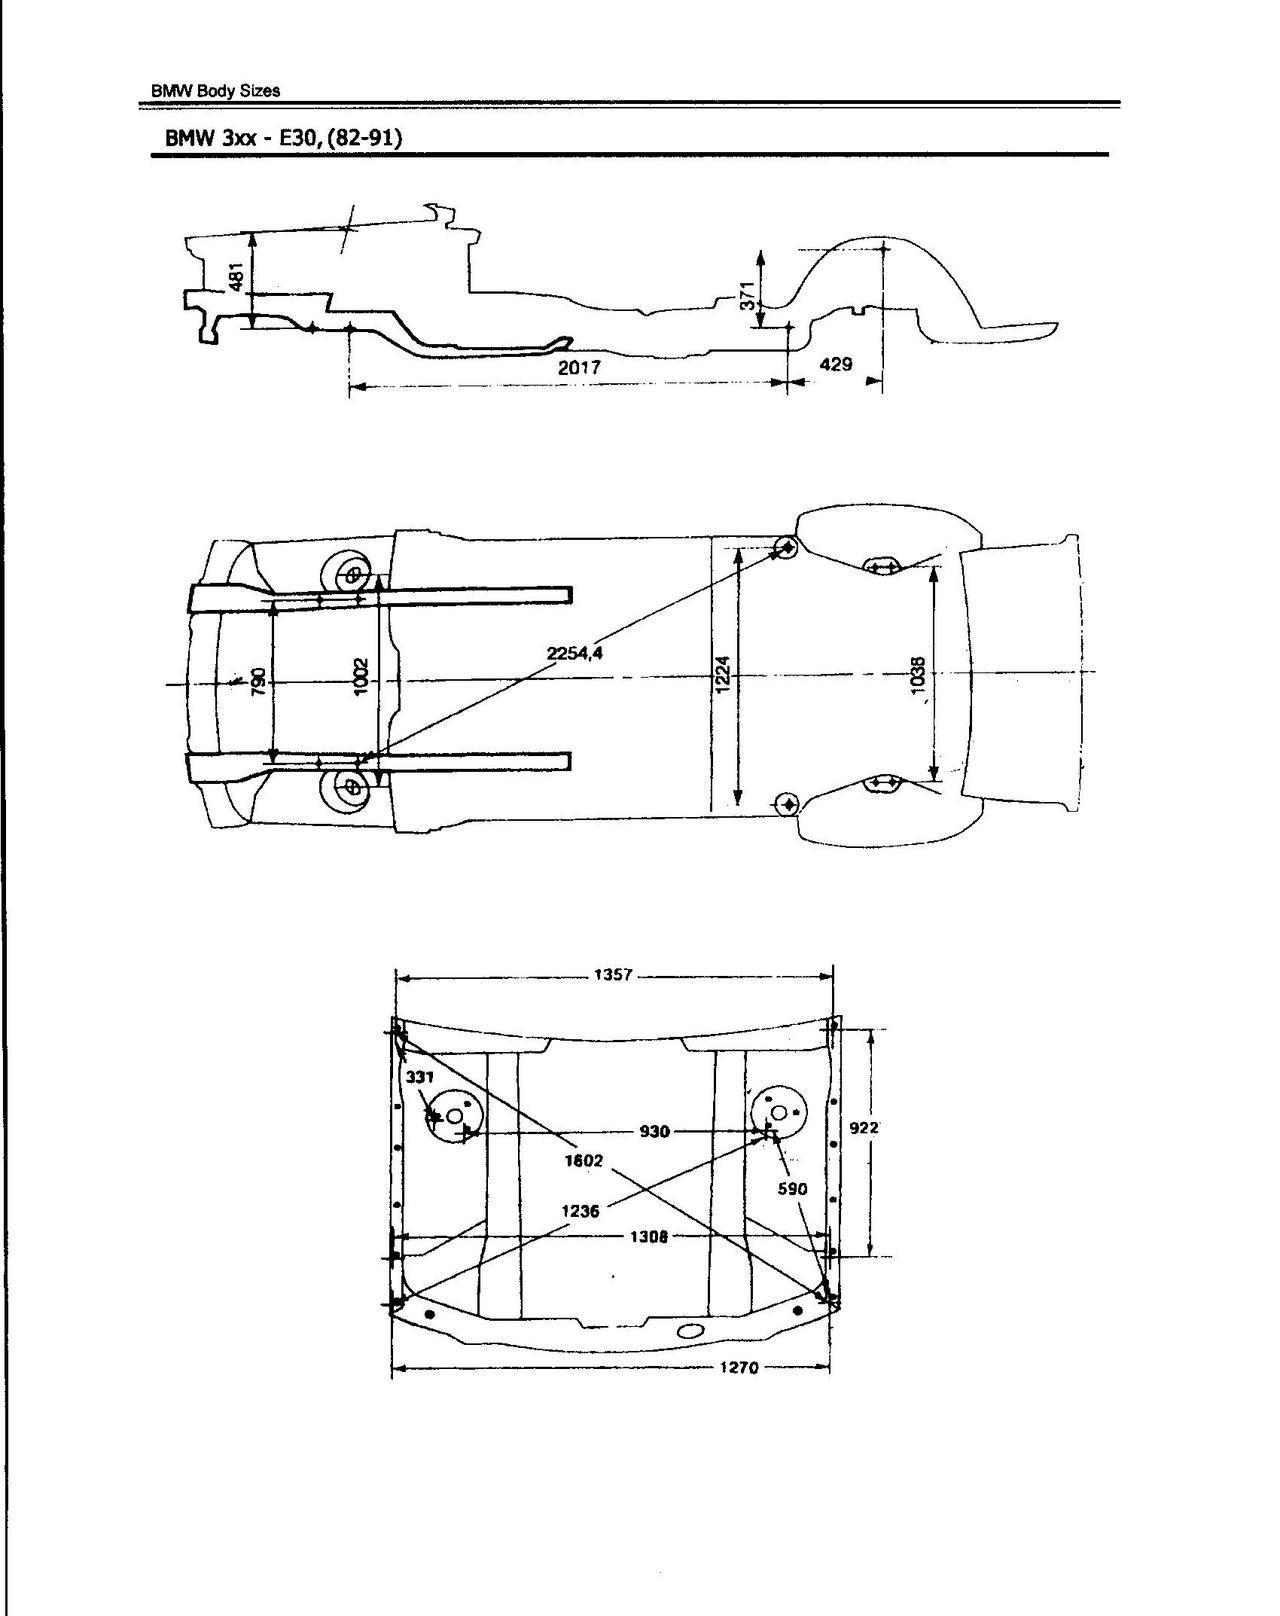 Чертеж, Размеры несущей части кузова BMW E30